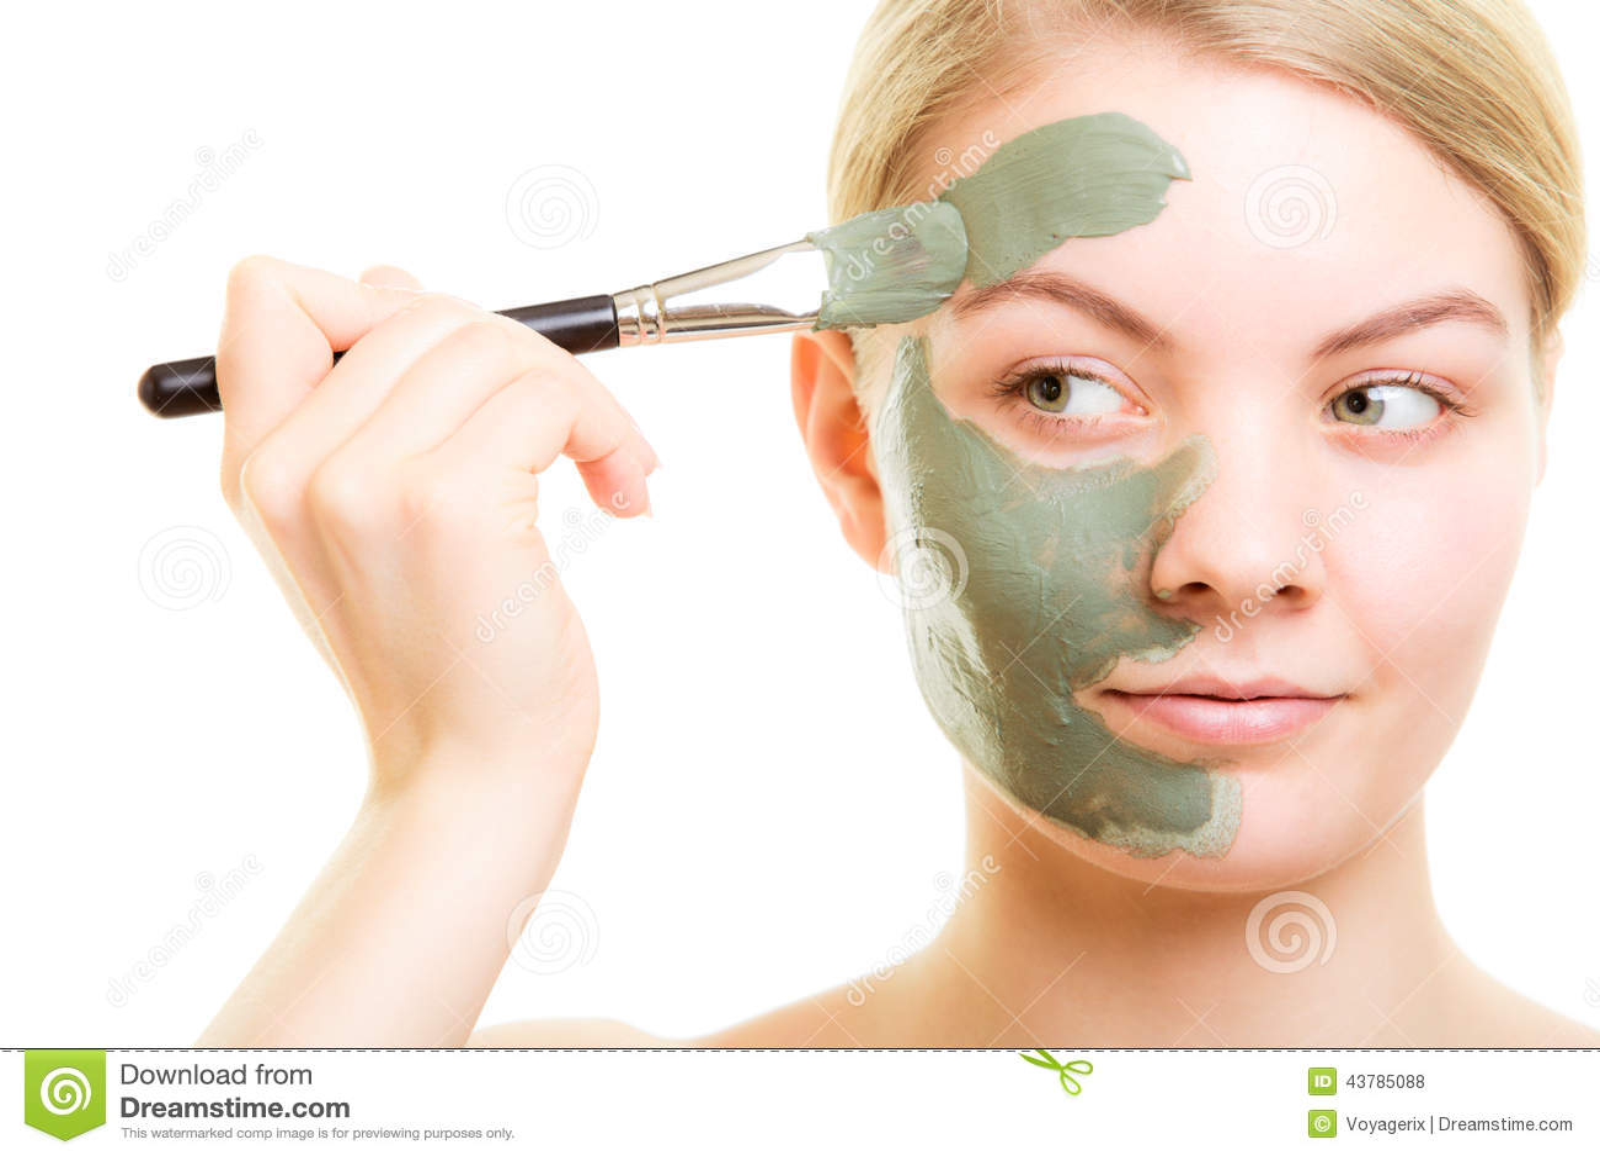 All Natural Organic Anti Aging Skin Care